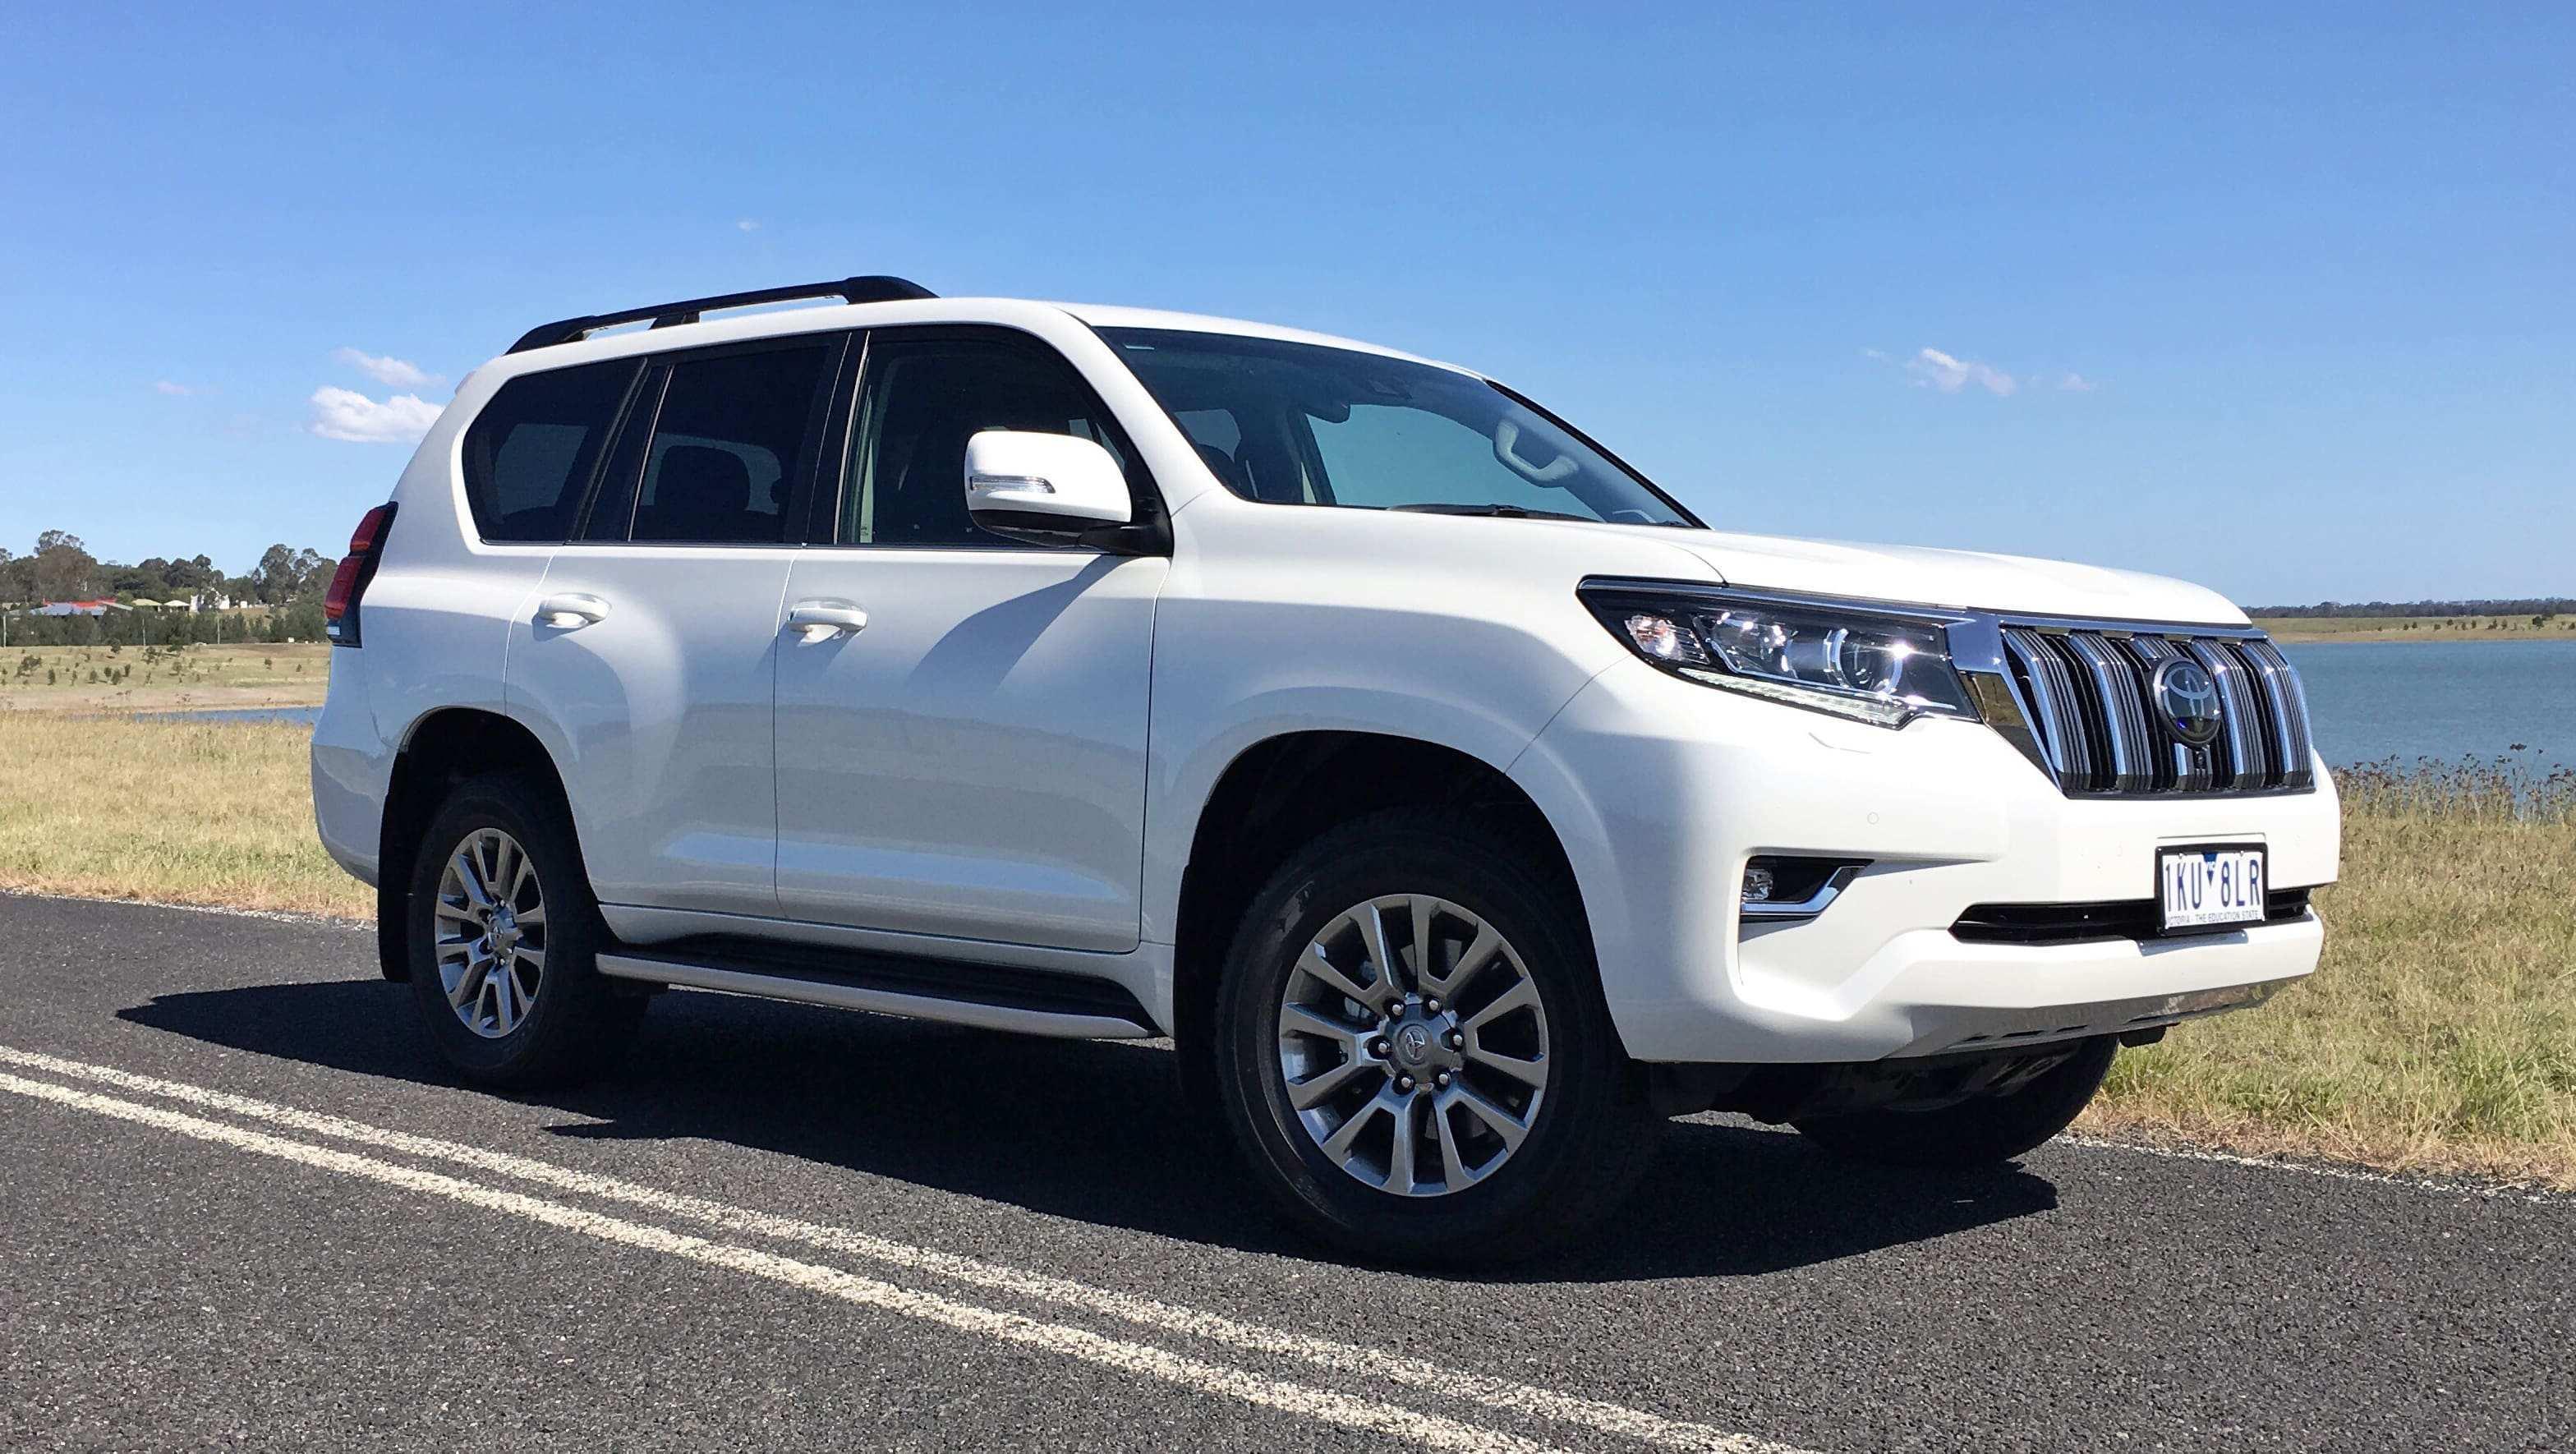 39 All New Toyota Prado 2019 Australia Performance with Toyota Prado 2019 Australia